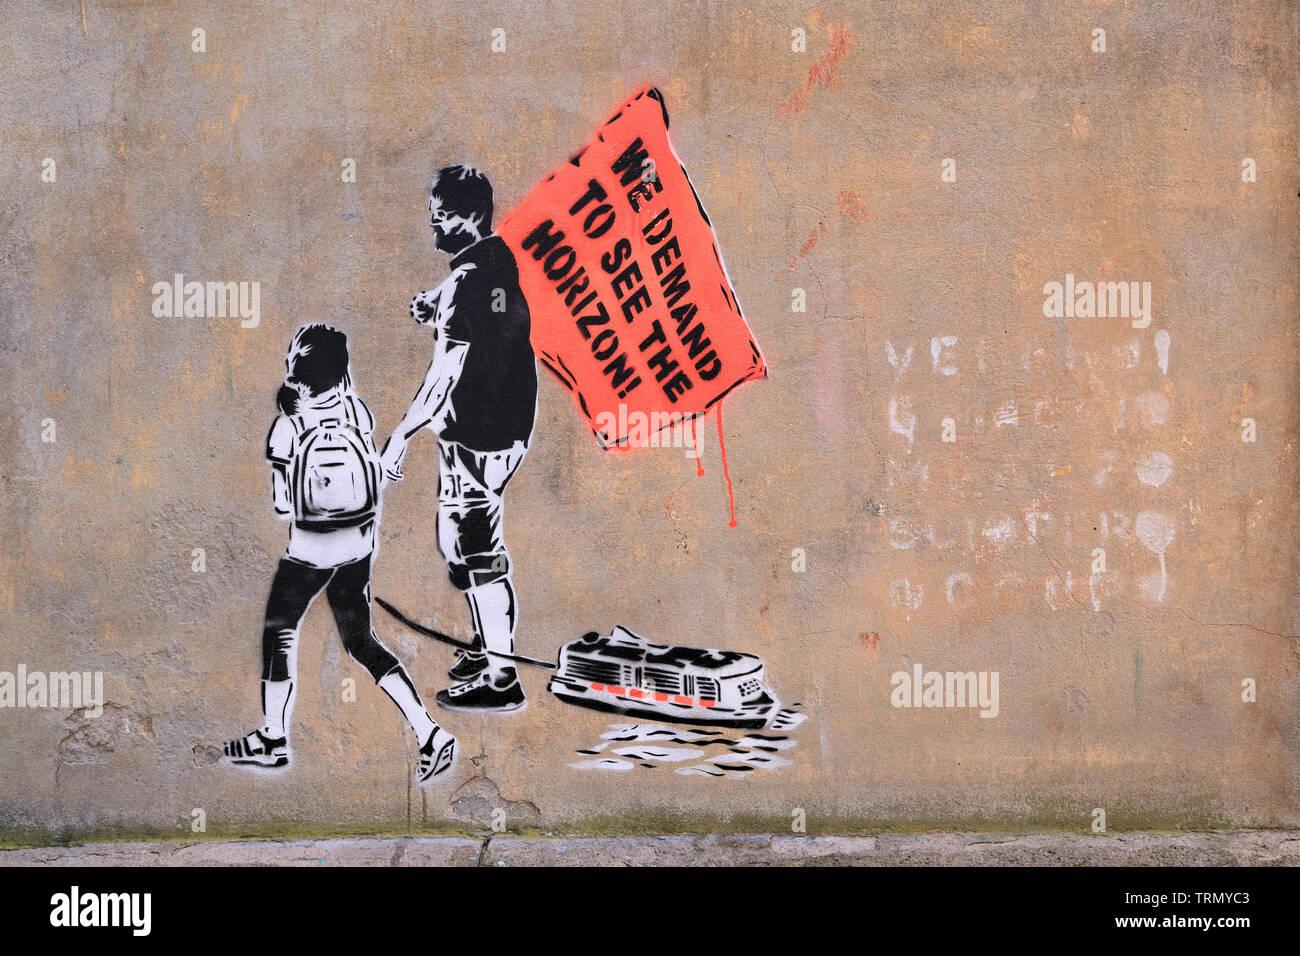 "Stencil street art protest against big cruise ships ""No grandi navi!"" (No big ships!), Venice, 2019 - Stock Image"